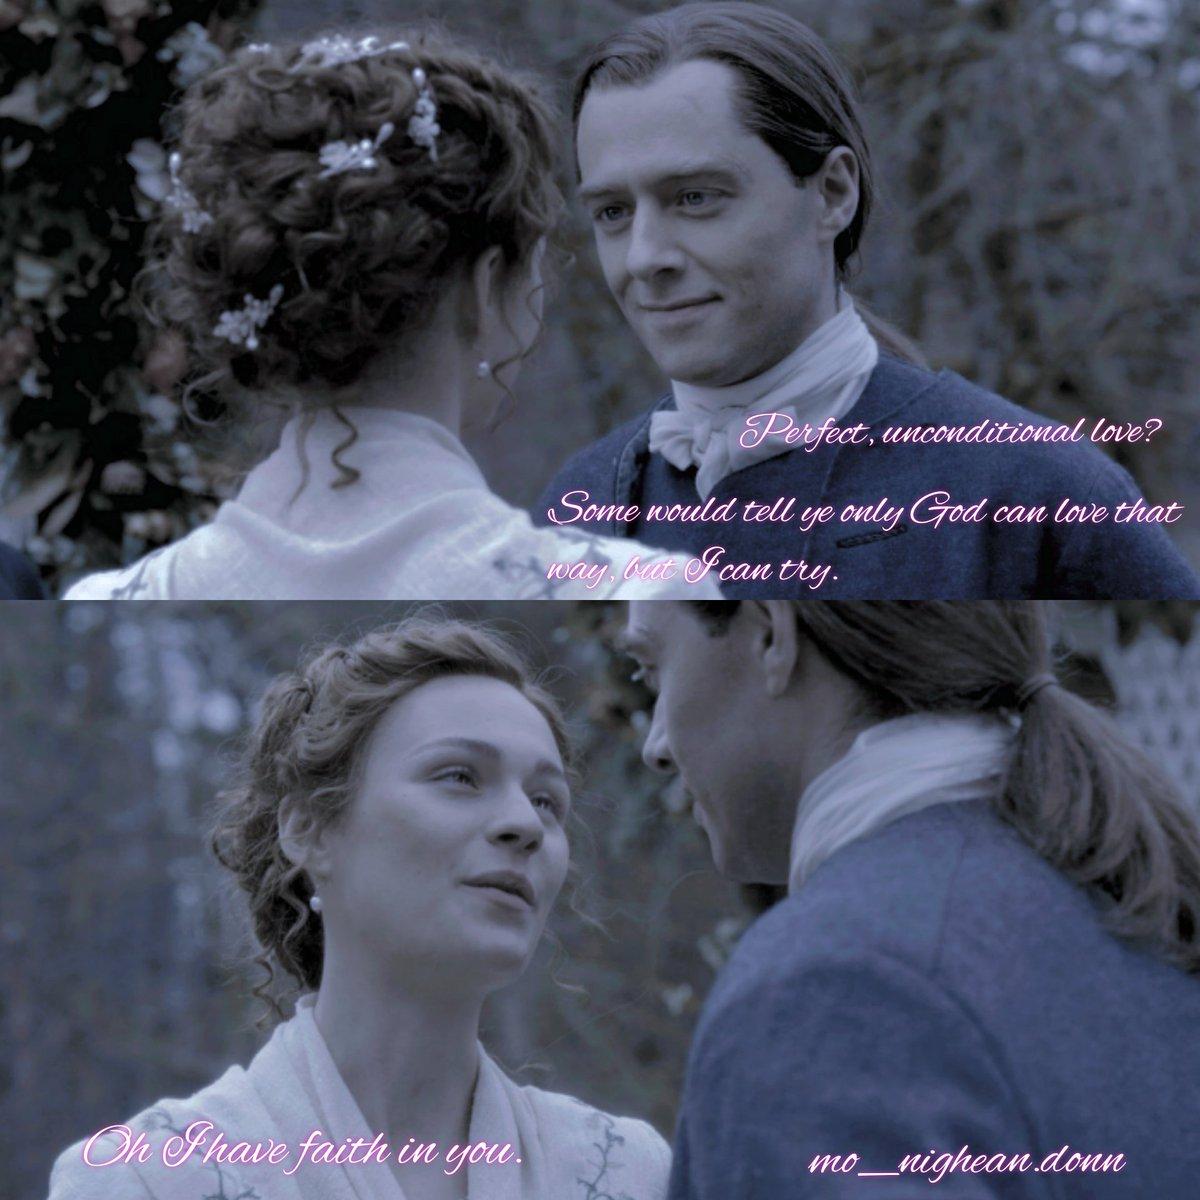 #RogerandBrianna #TheMacKenzies #BriannaFraserMacKenzie  #RogerMac #Outlander #OutlanderS5 #TheFieryCross #FrasersRidge #RichardRankinandSophieSkelton #RichardRankin #SophieSkelton